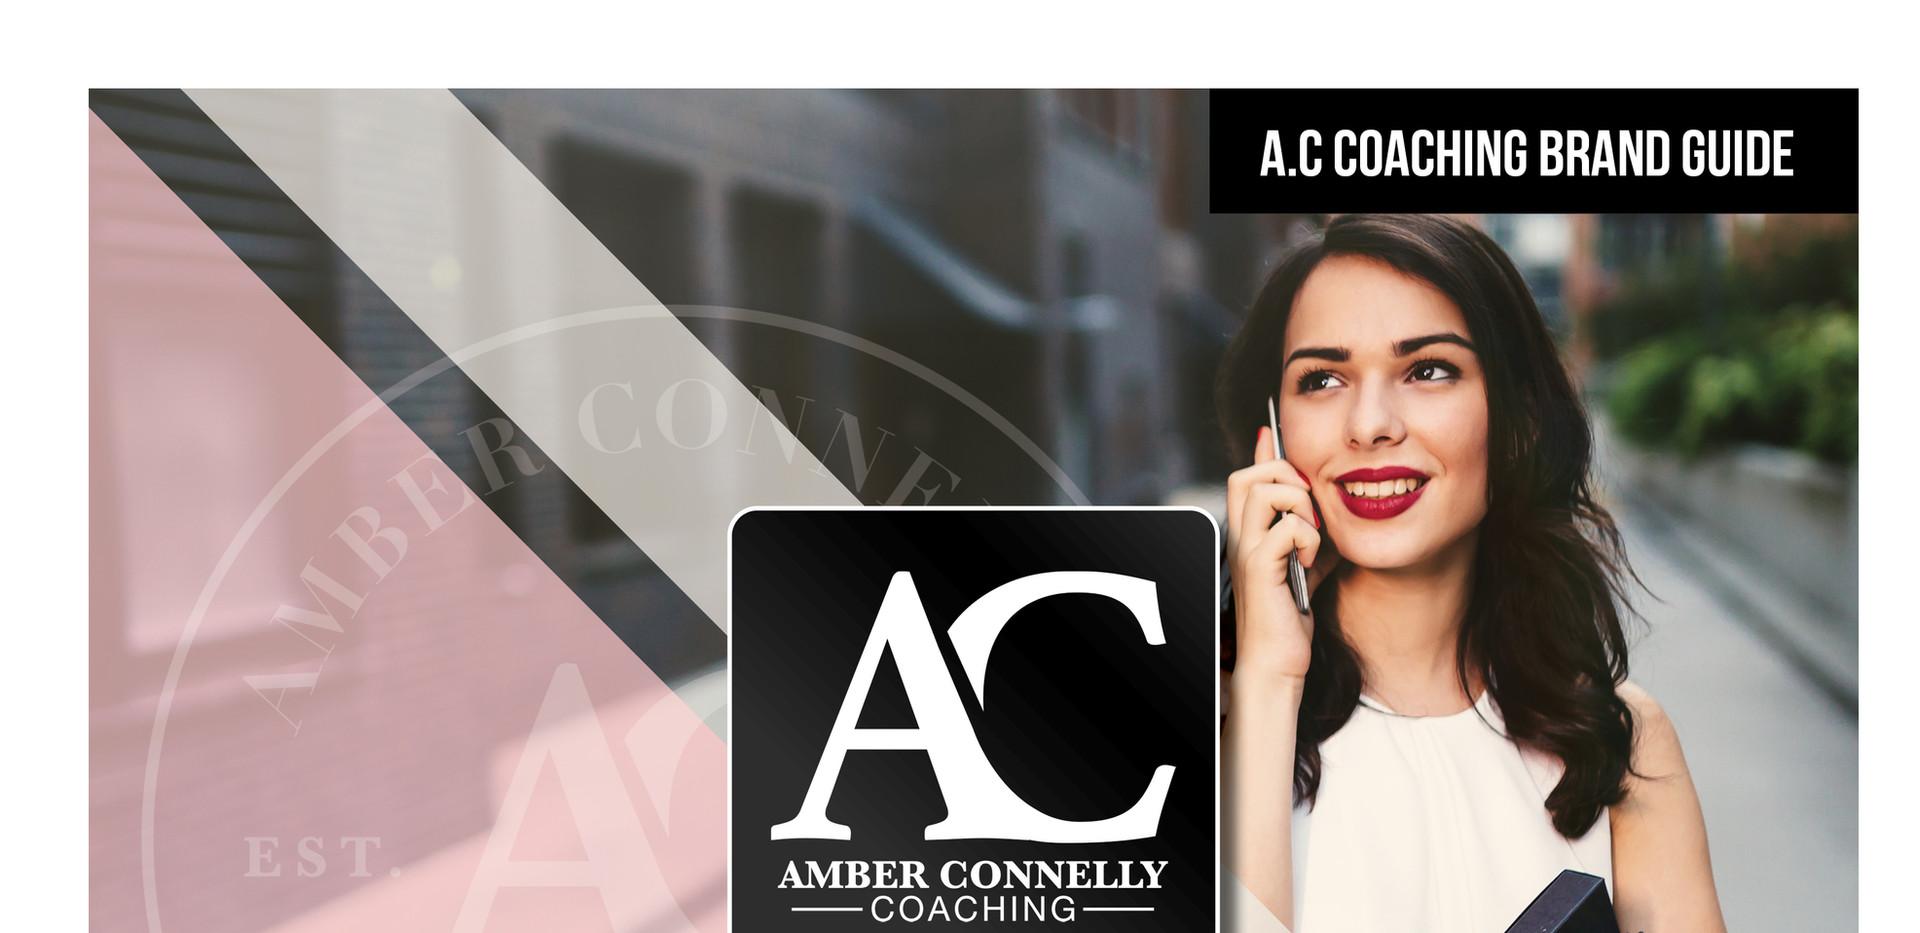 ACC_brandGuide.jpg